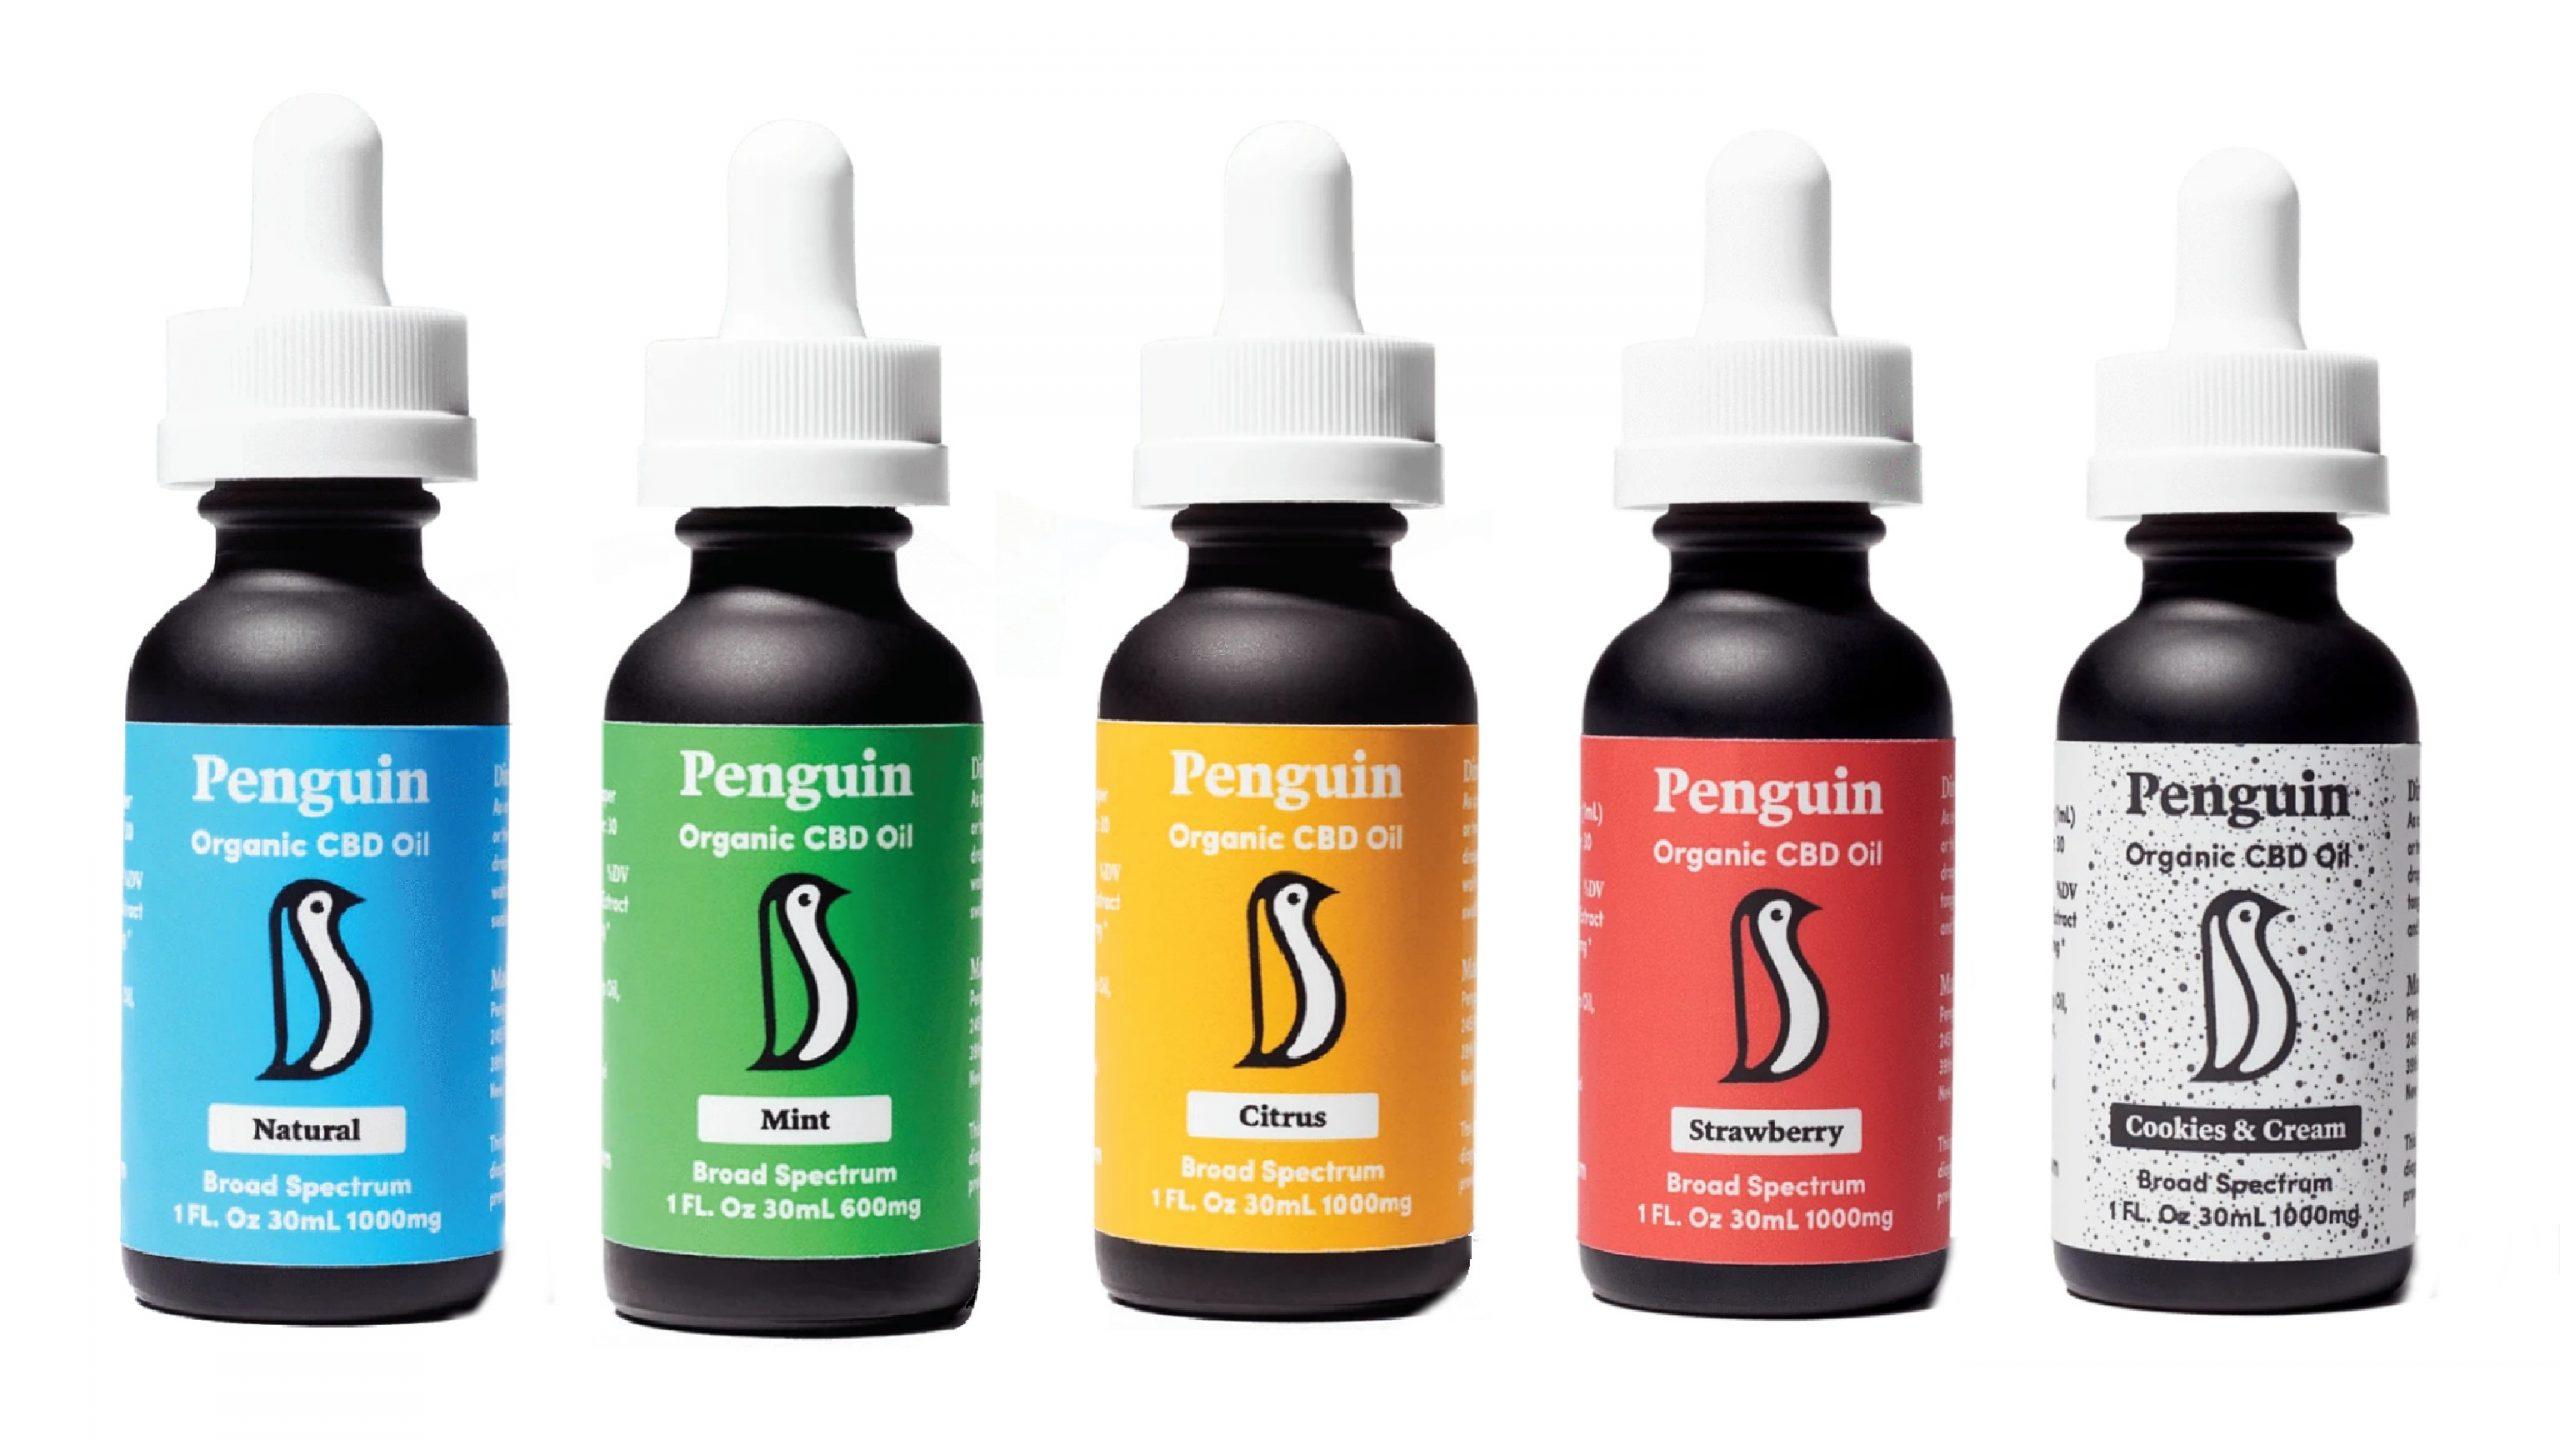 Penguin CBD black friday 2020